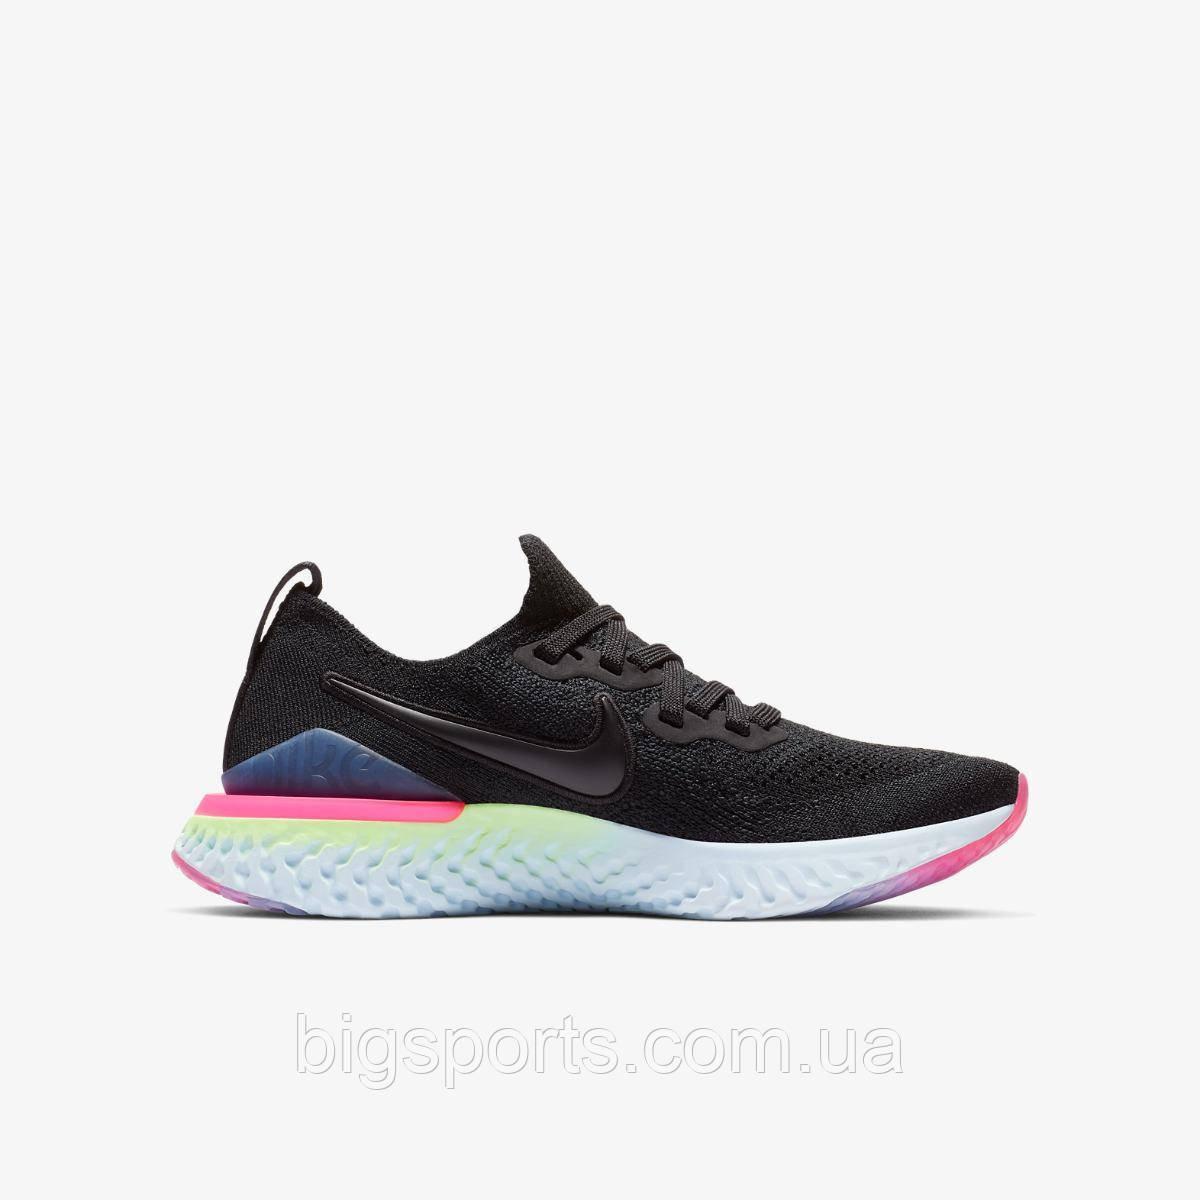 Кроссовки дет. Nike Epic React Flyknit 2 (GS) (арт. AQ3243-003), фото 1